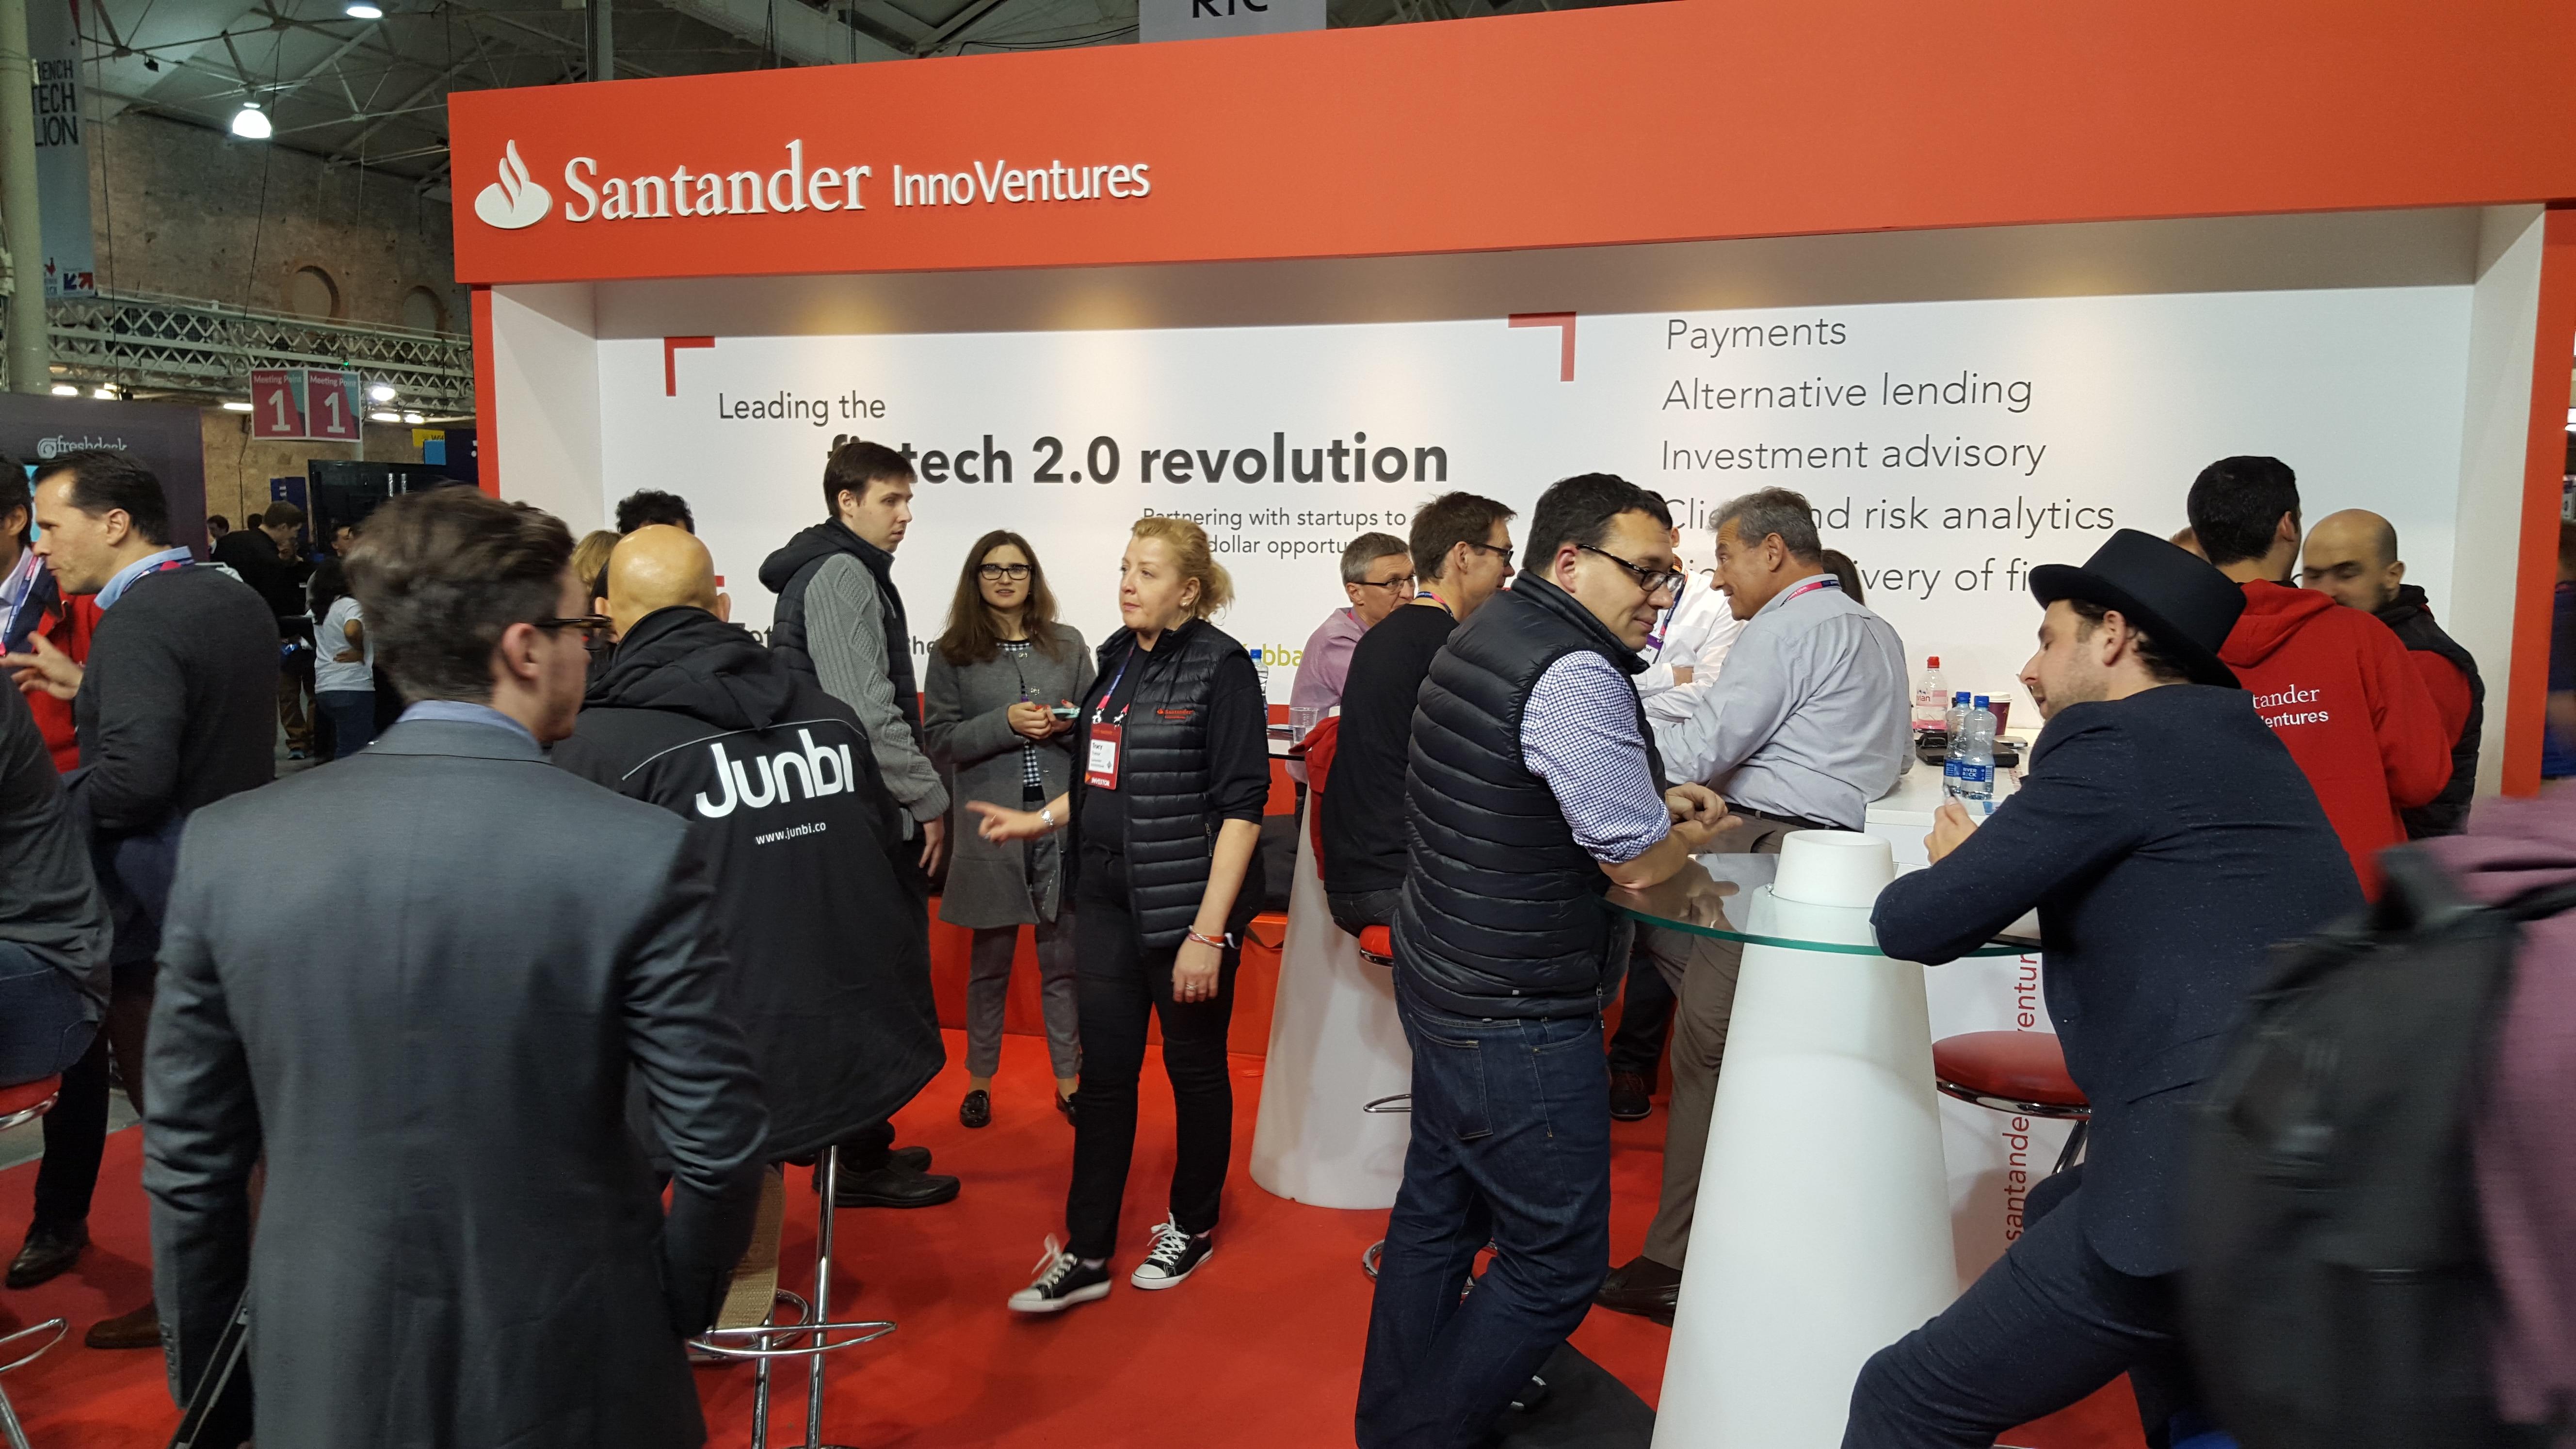 Santander Innoventures